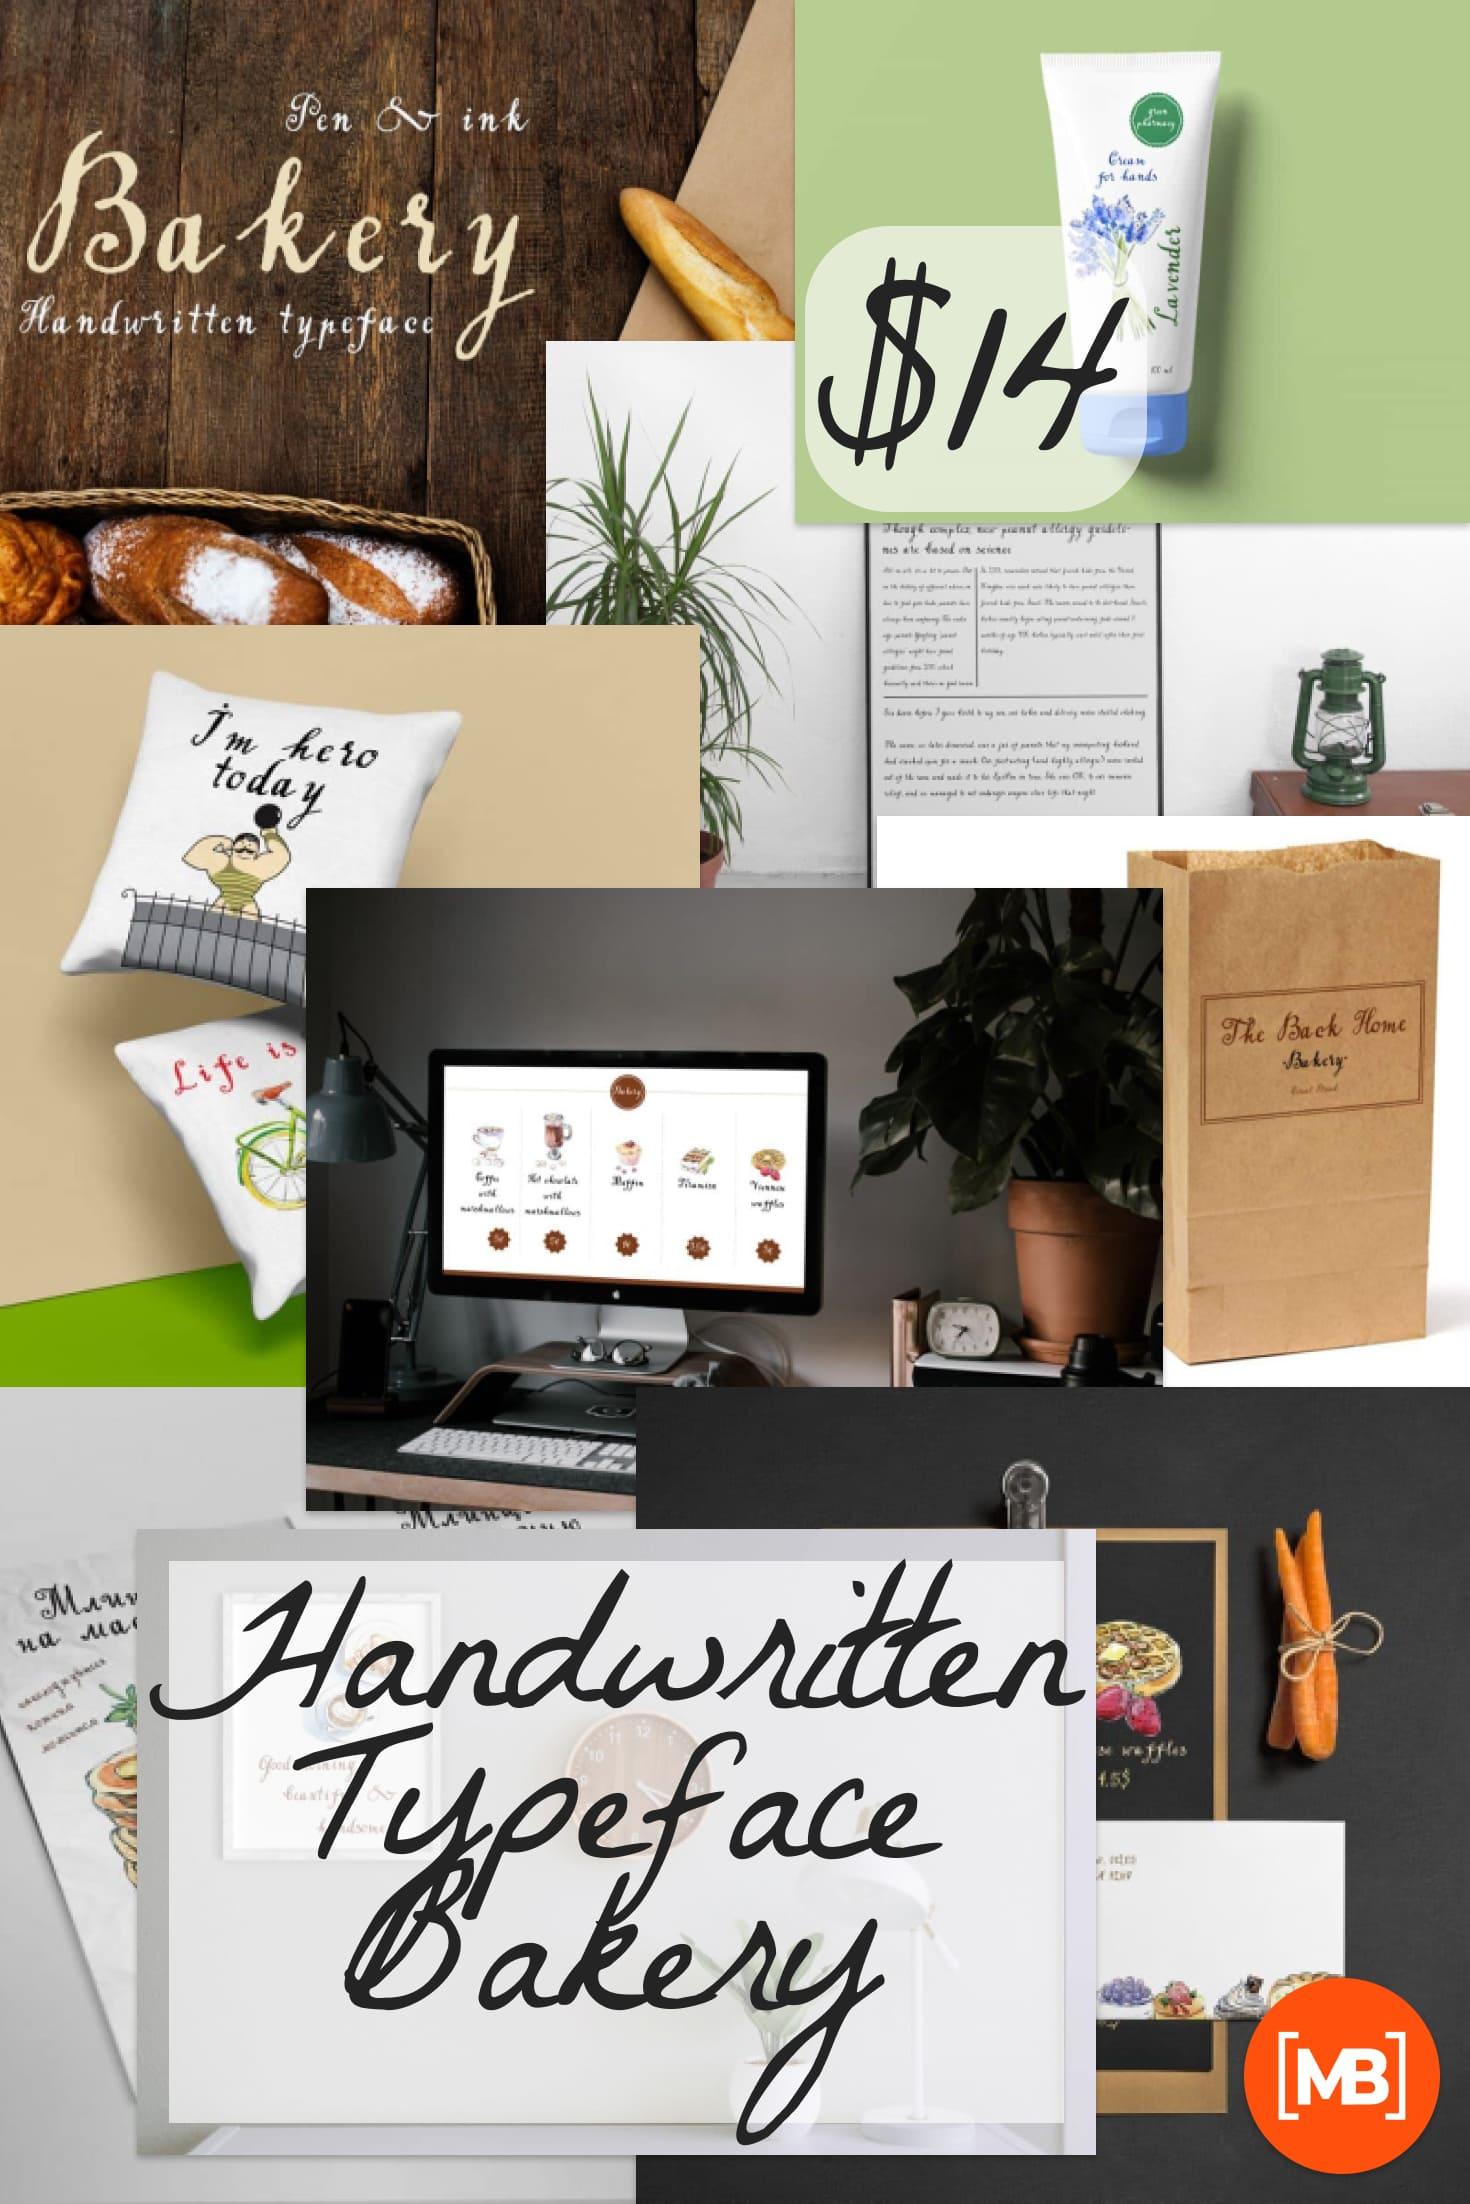 Pinterest Image: Handwritten Typeface Bakery - $14.